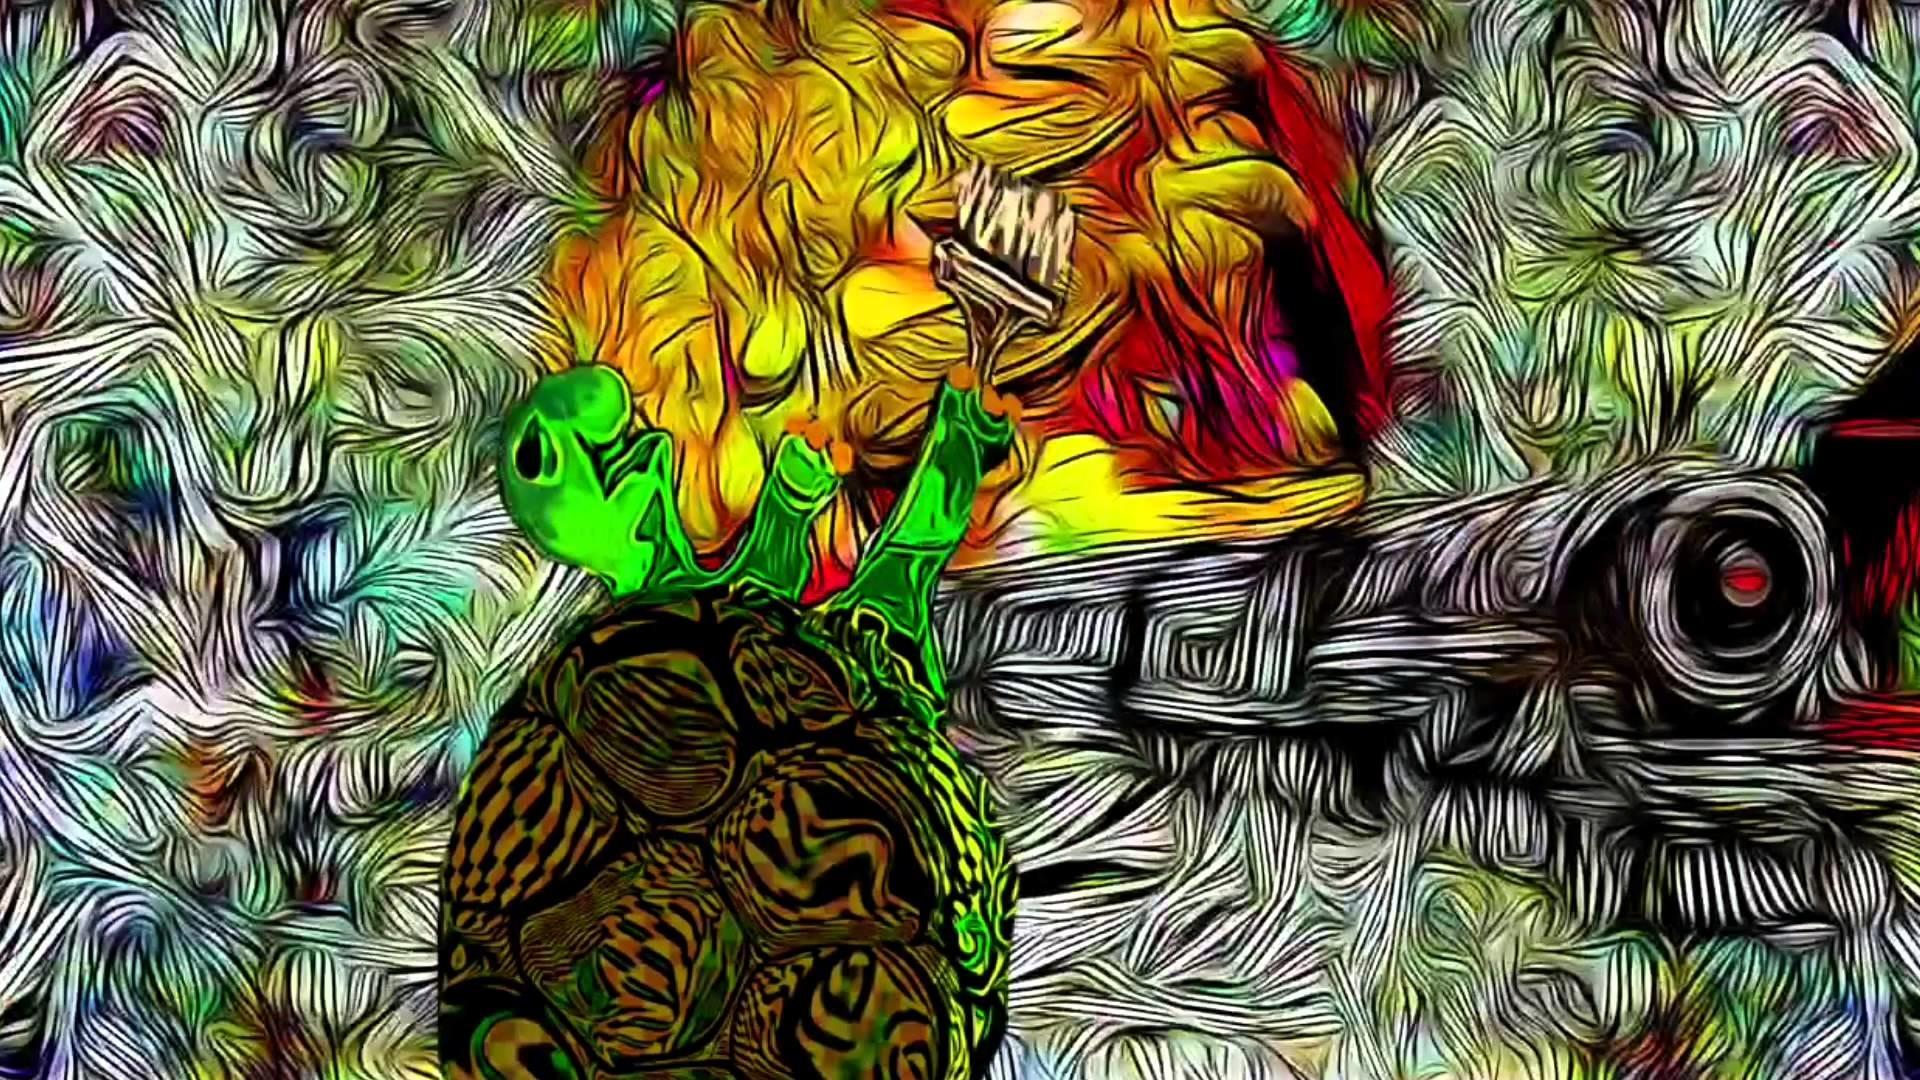 HD Grateful Dead Wallpaper (65+ images)